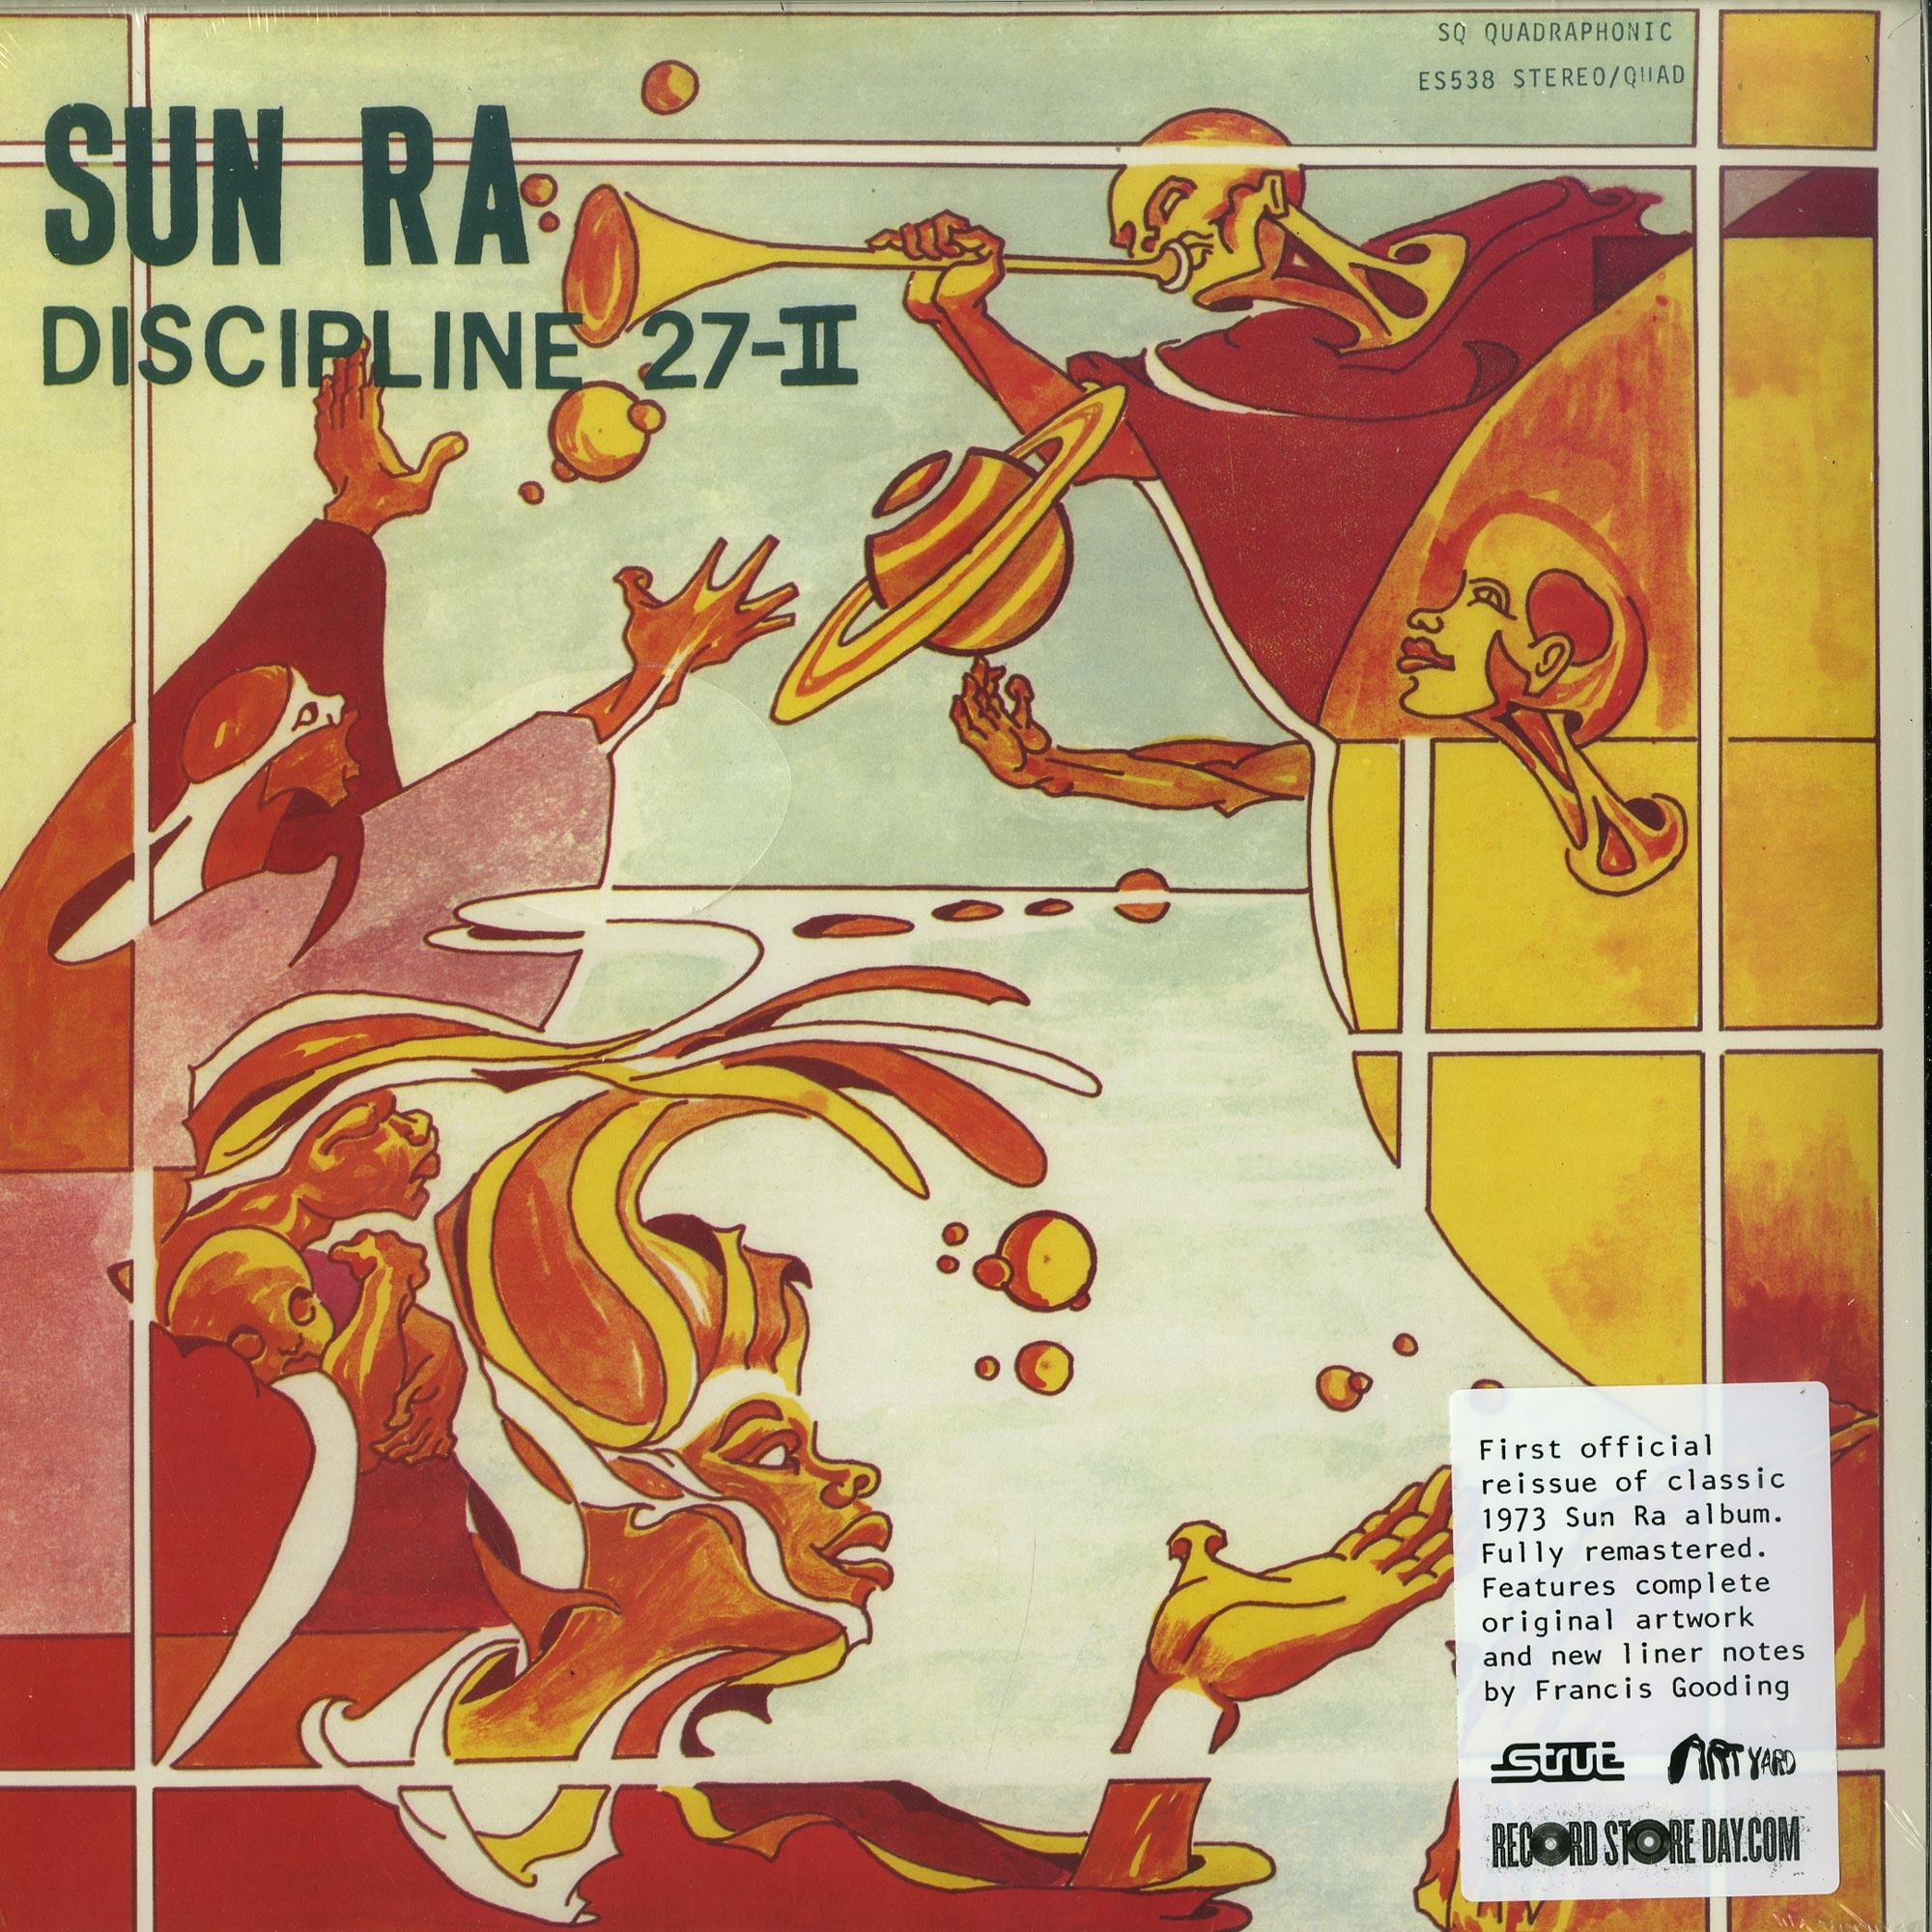 Sun Ra - DISCIPLINE 27-II